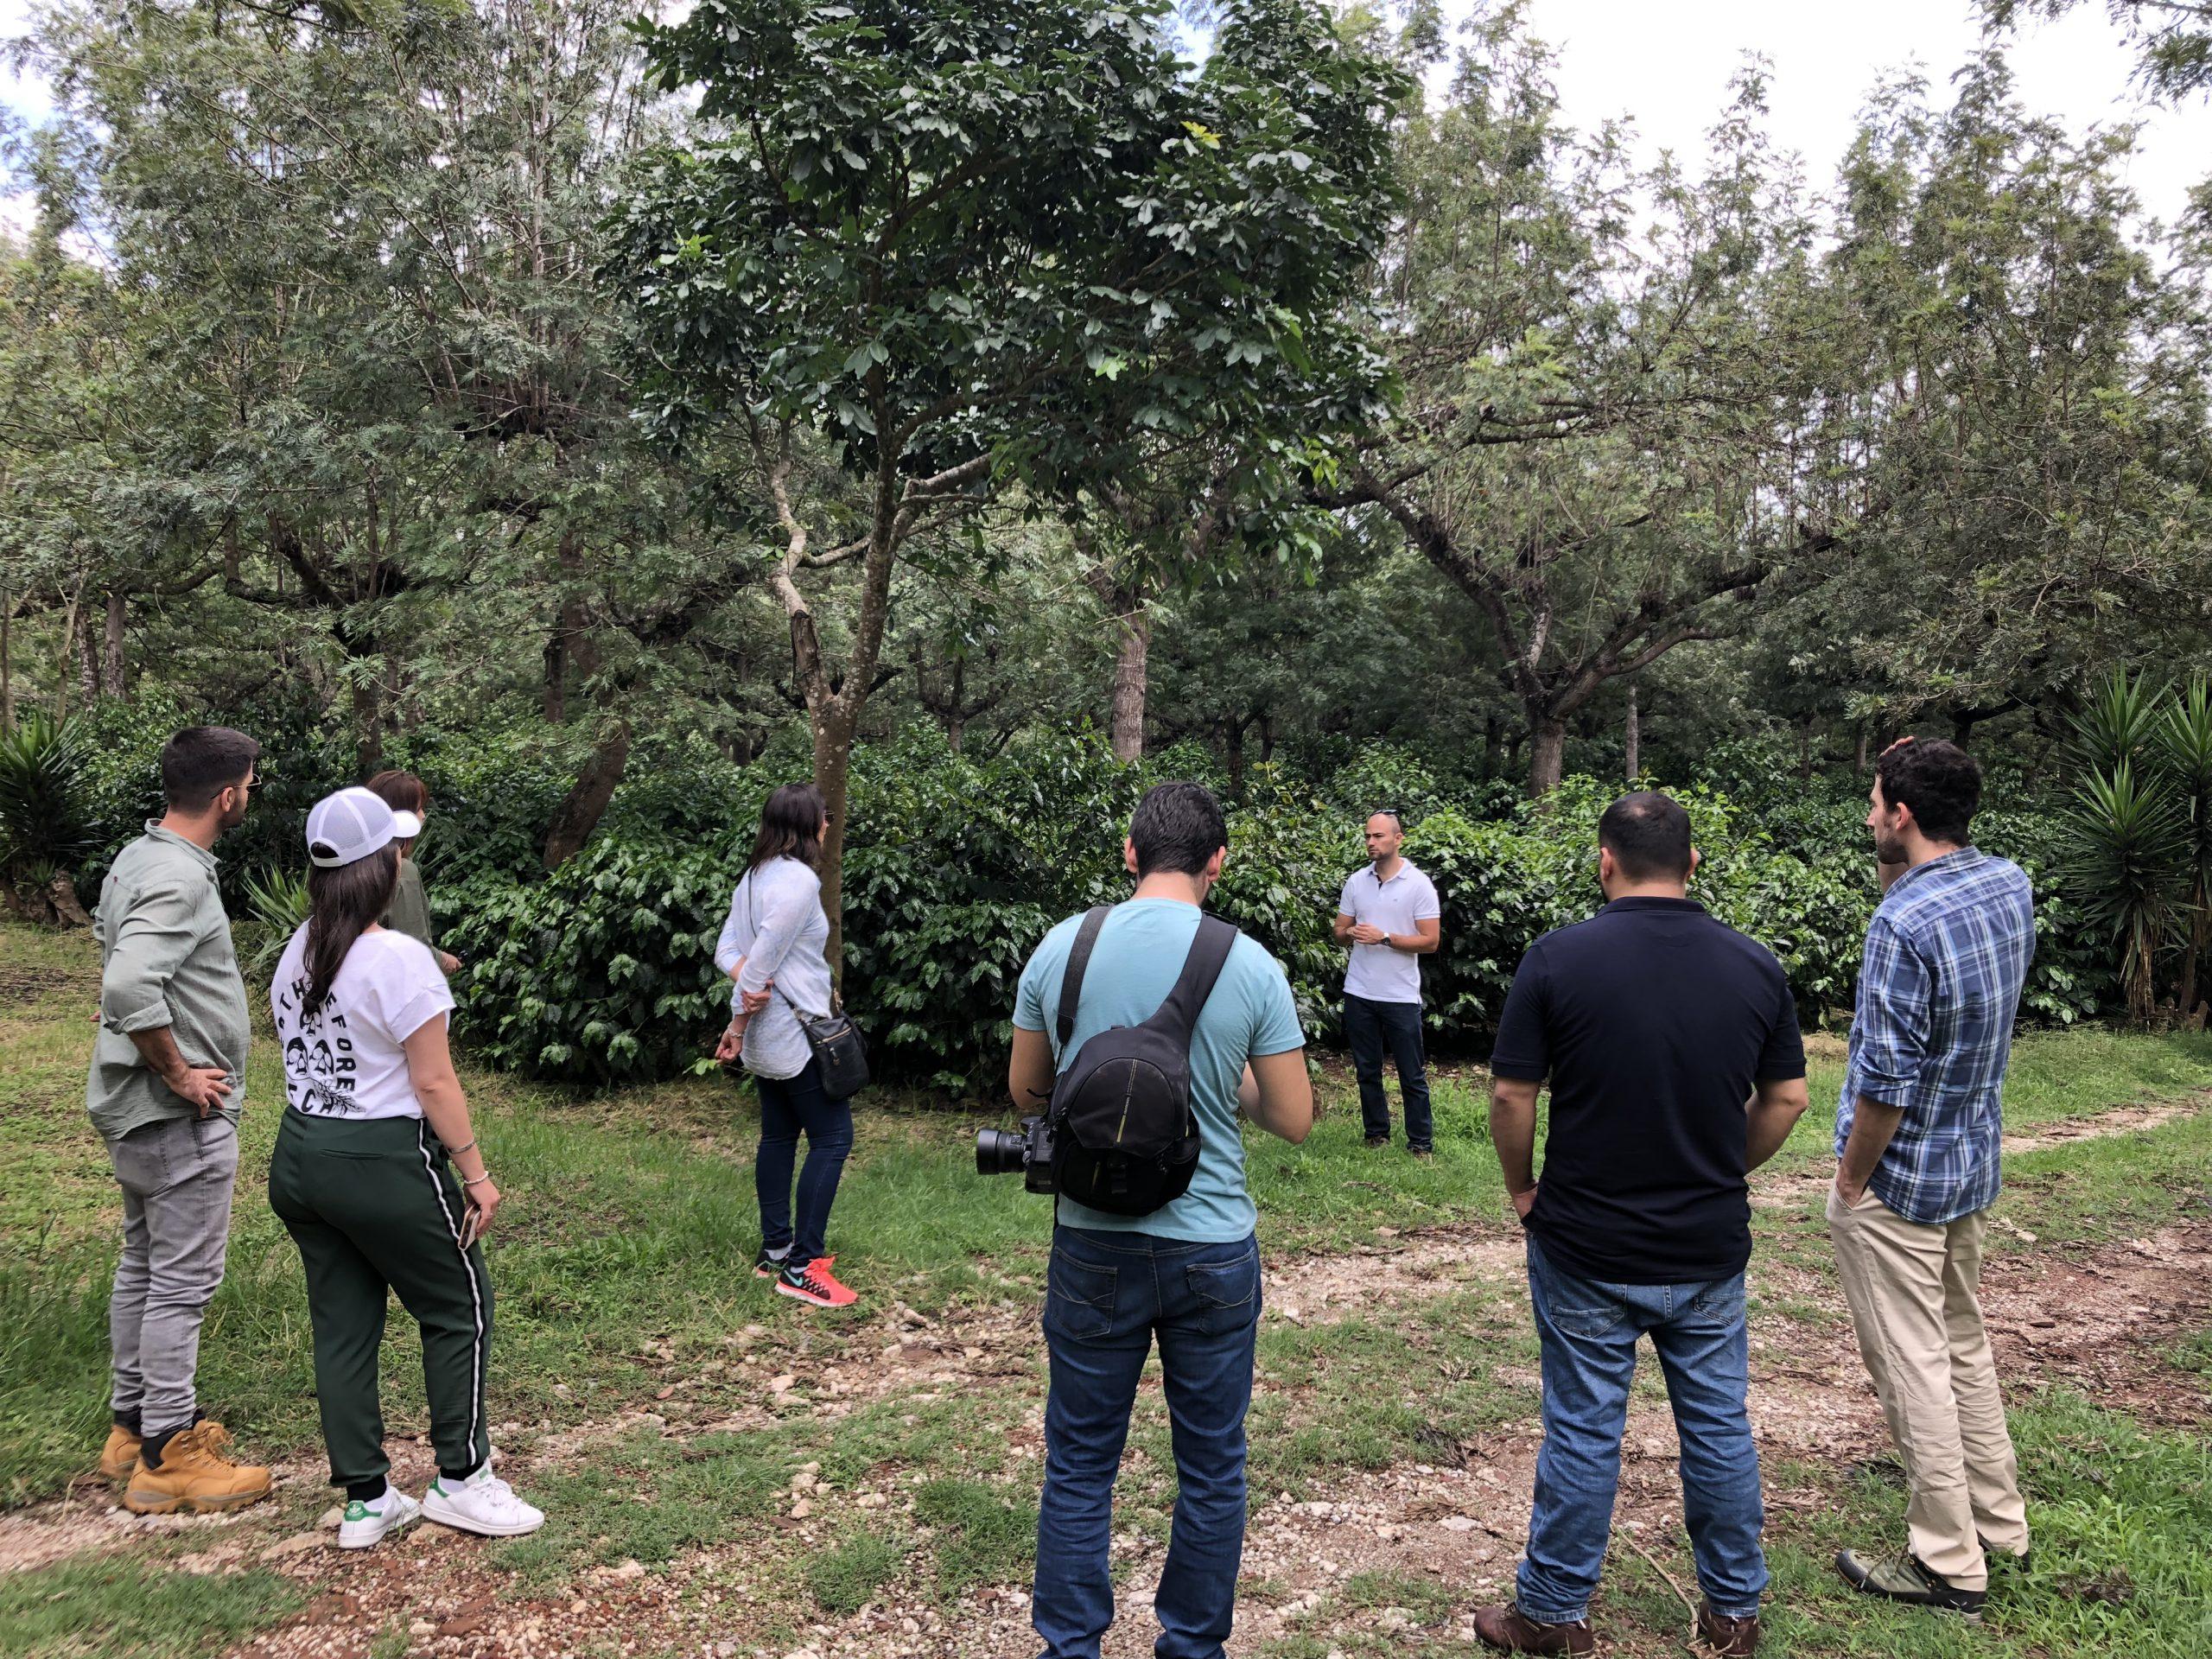 Coffee roasters visiting a coffee crop